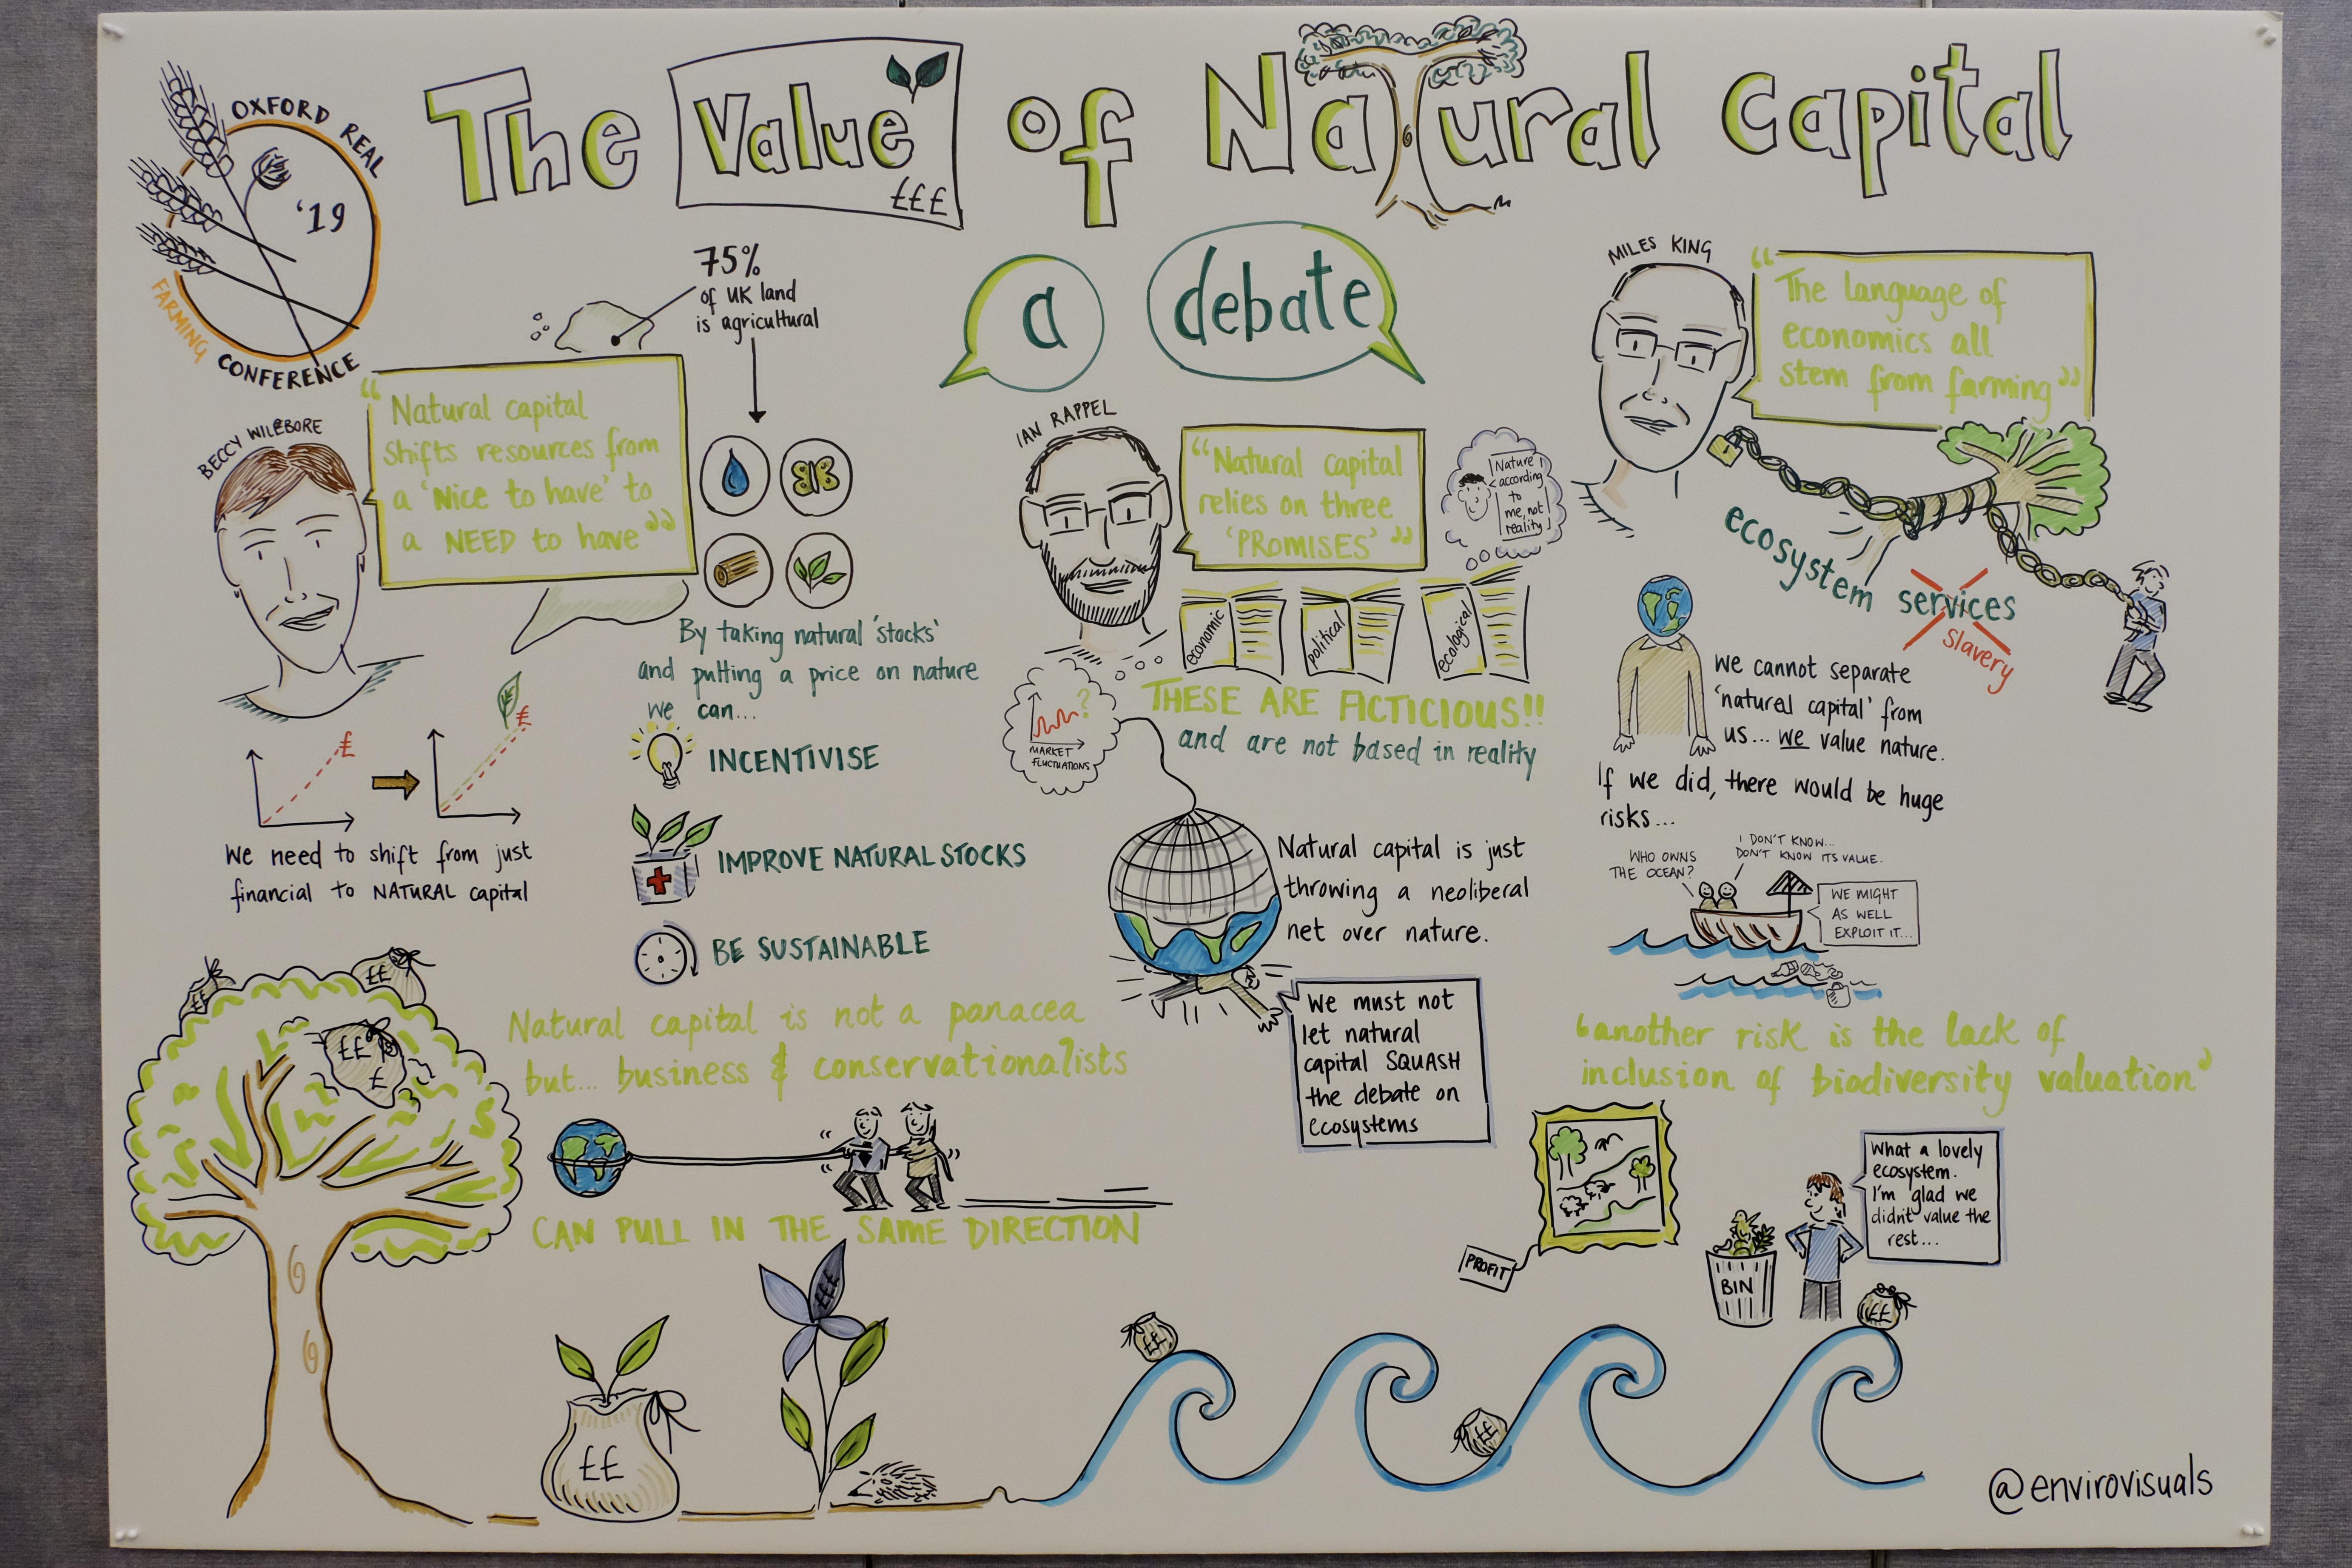 natural capital credit Hugh Warwick